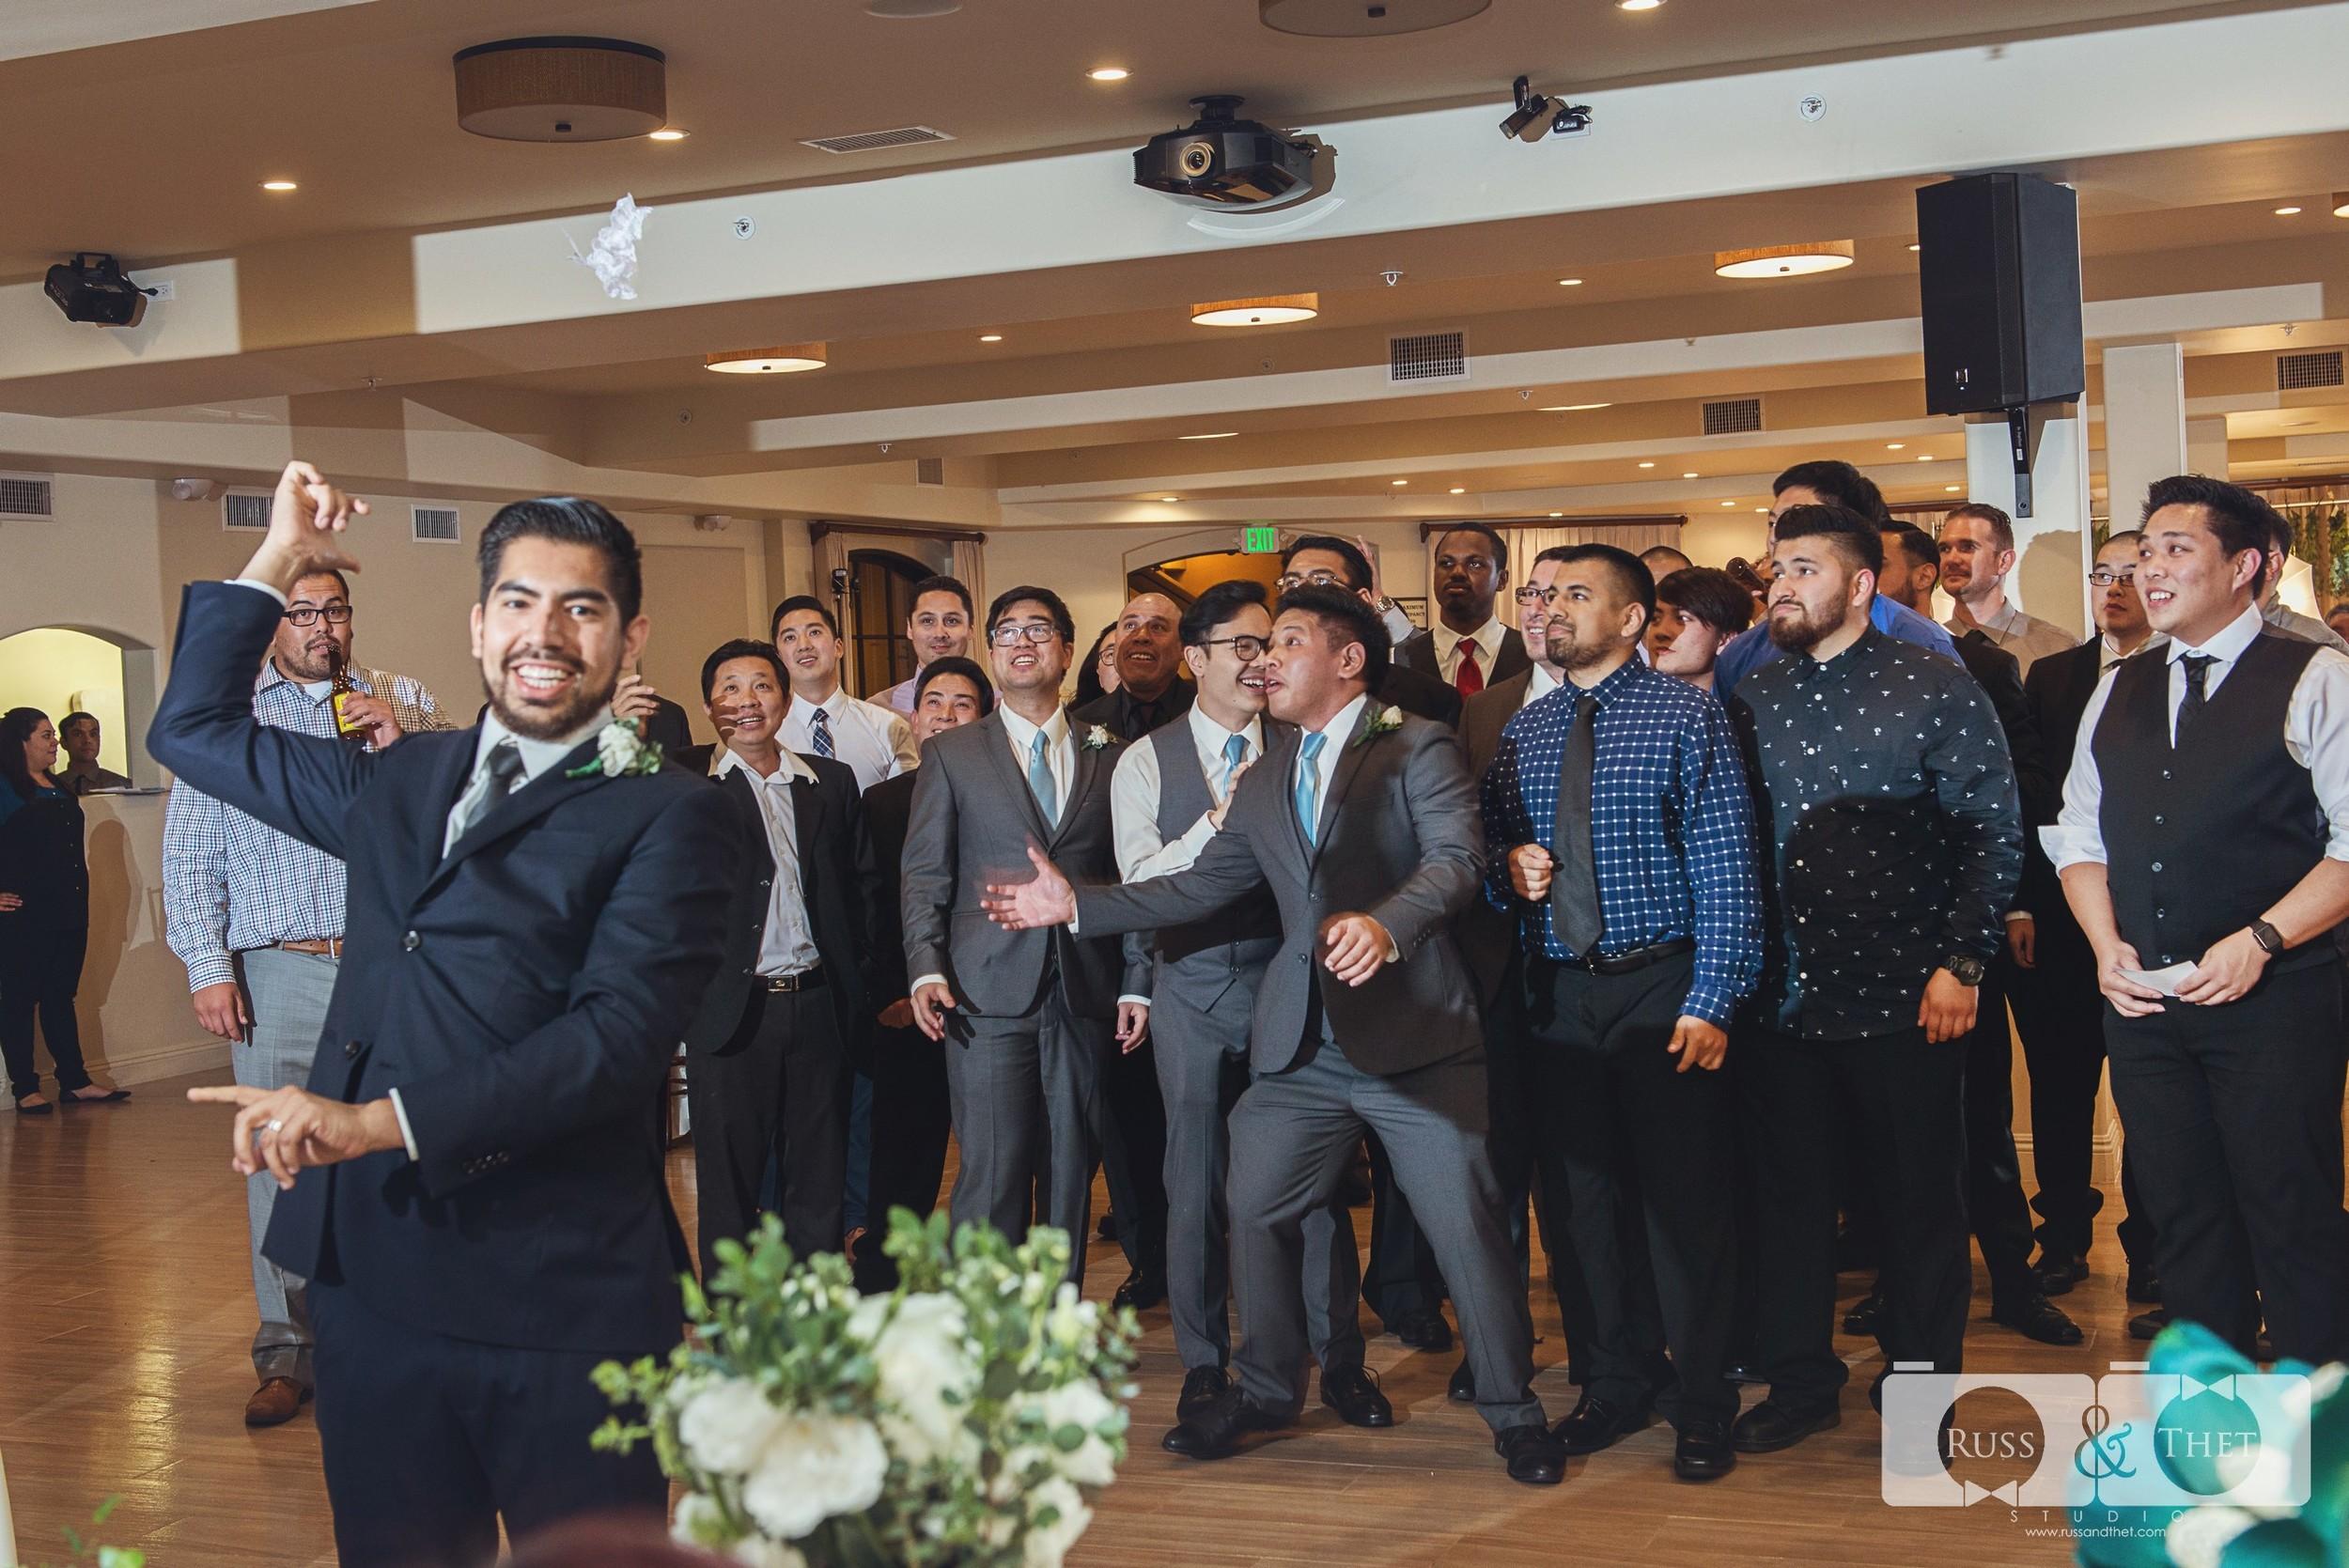 plaza-de-magdalena-Wedding (42).jpg